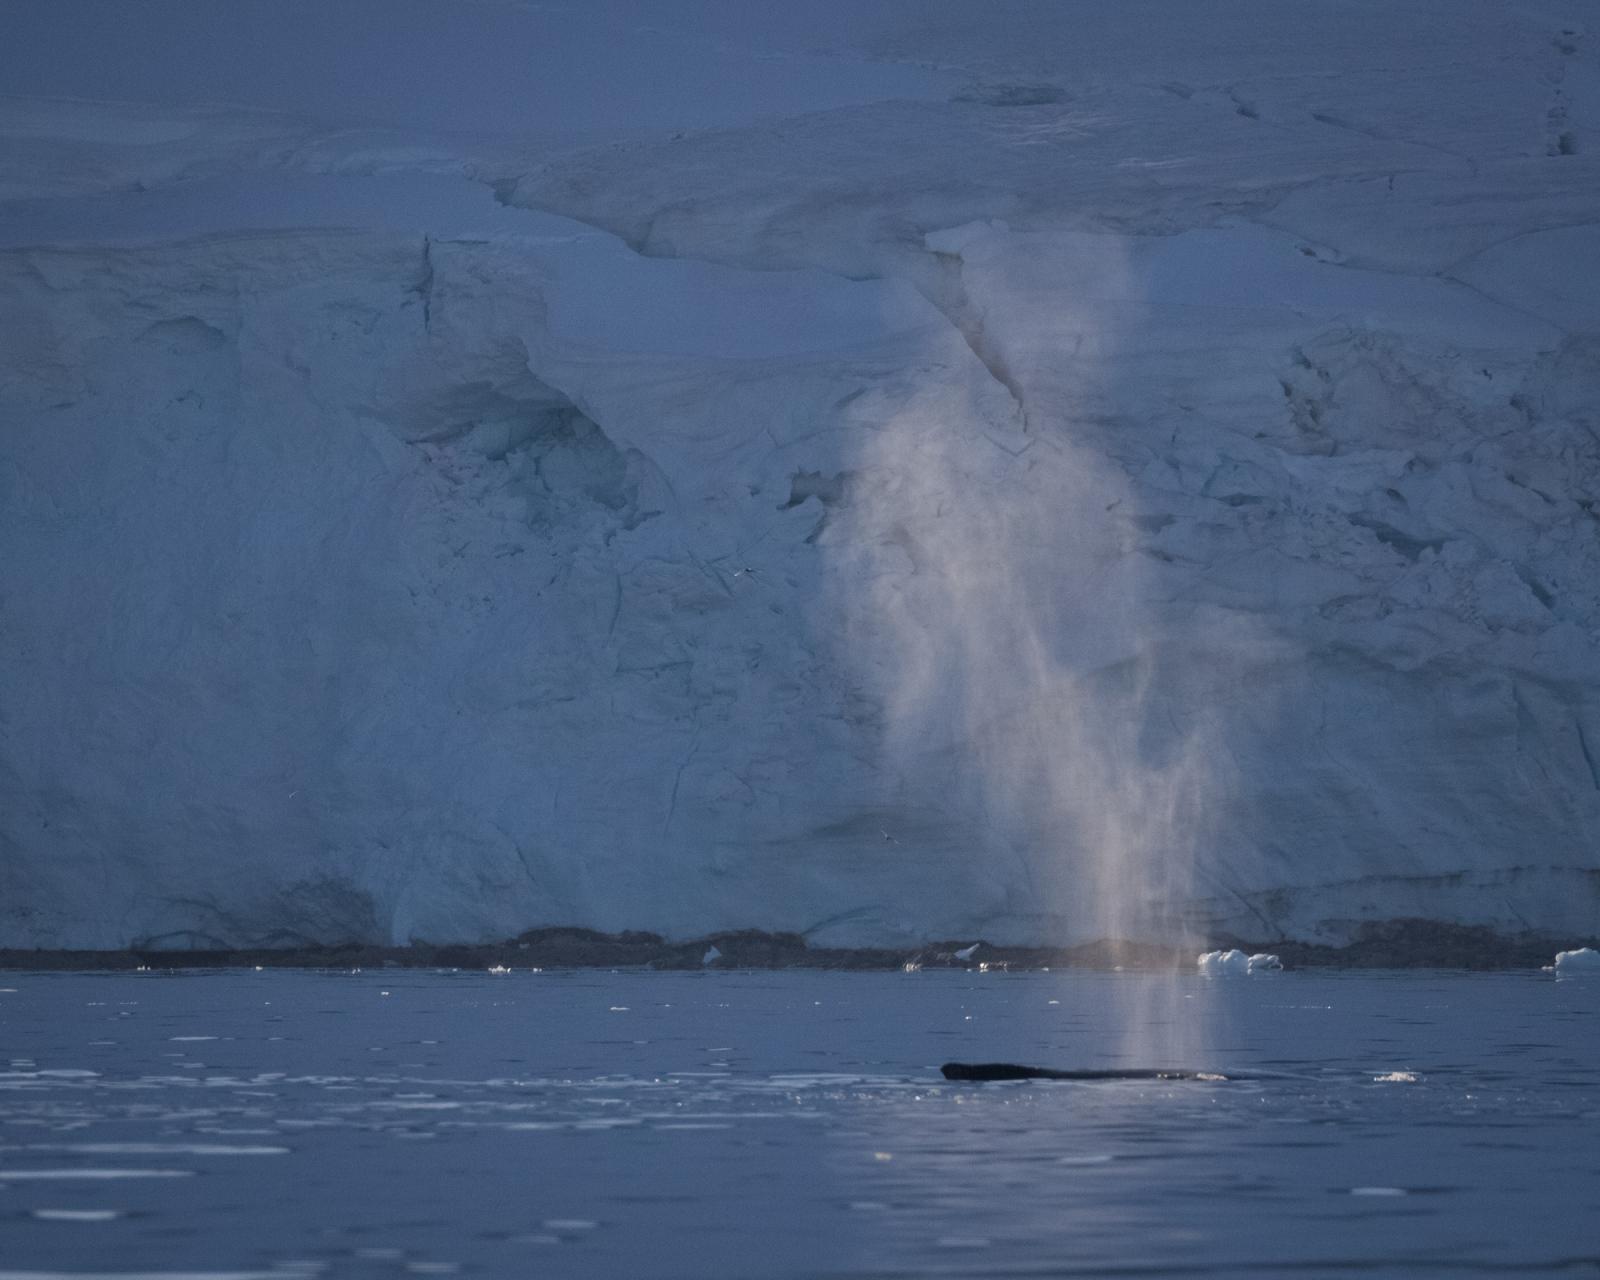 Art and Documentary Photography - Loading 0_Antarctica_UPLOAD_acaciajohnson_9.jpg